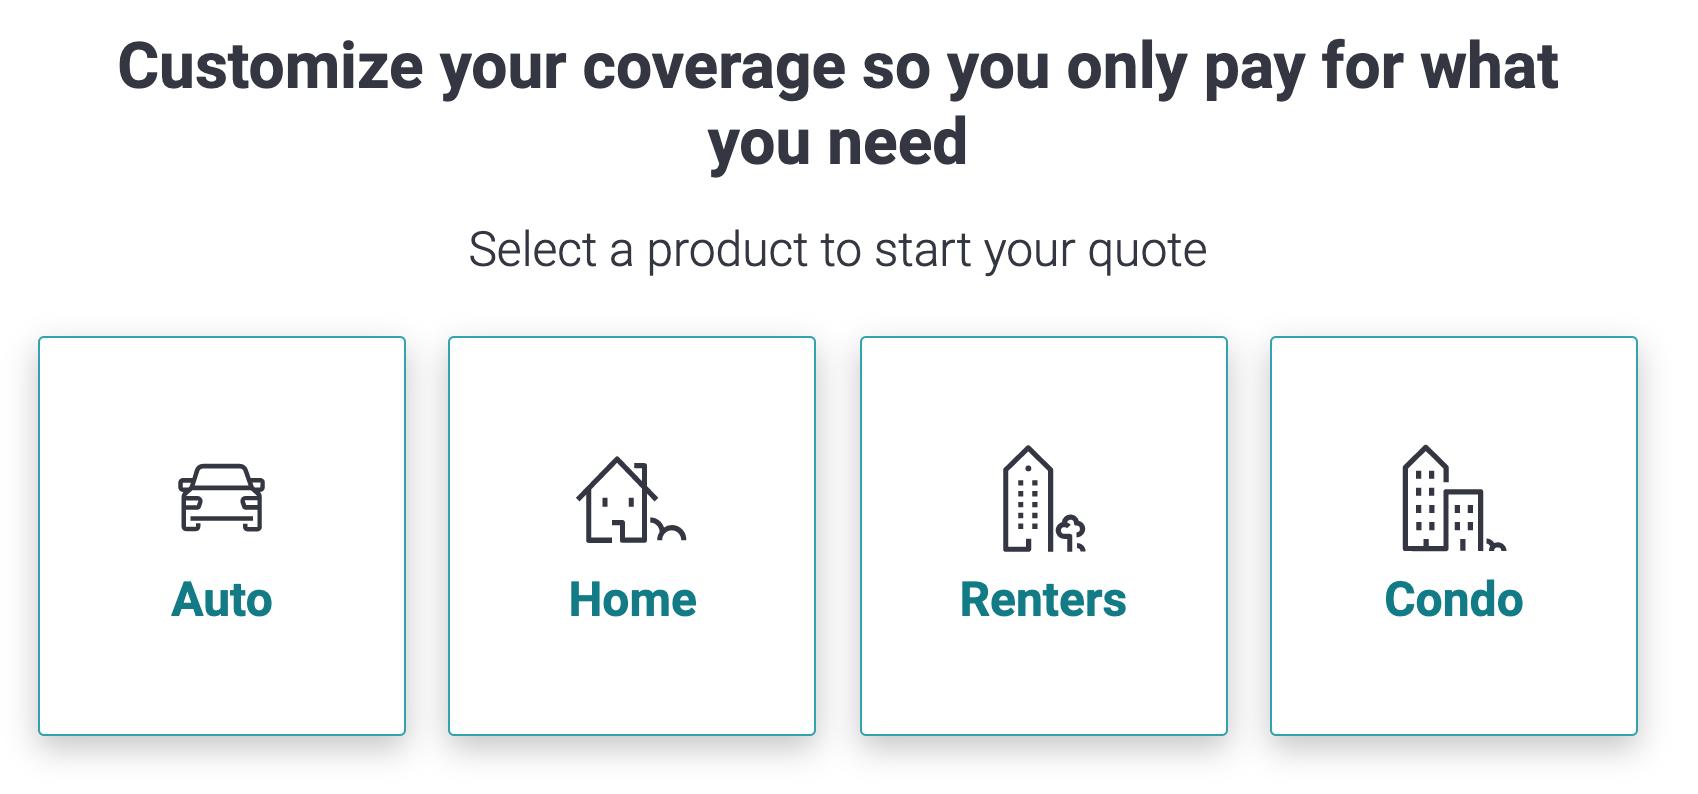 Liberty Mutual product selection screen